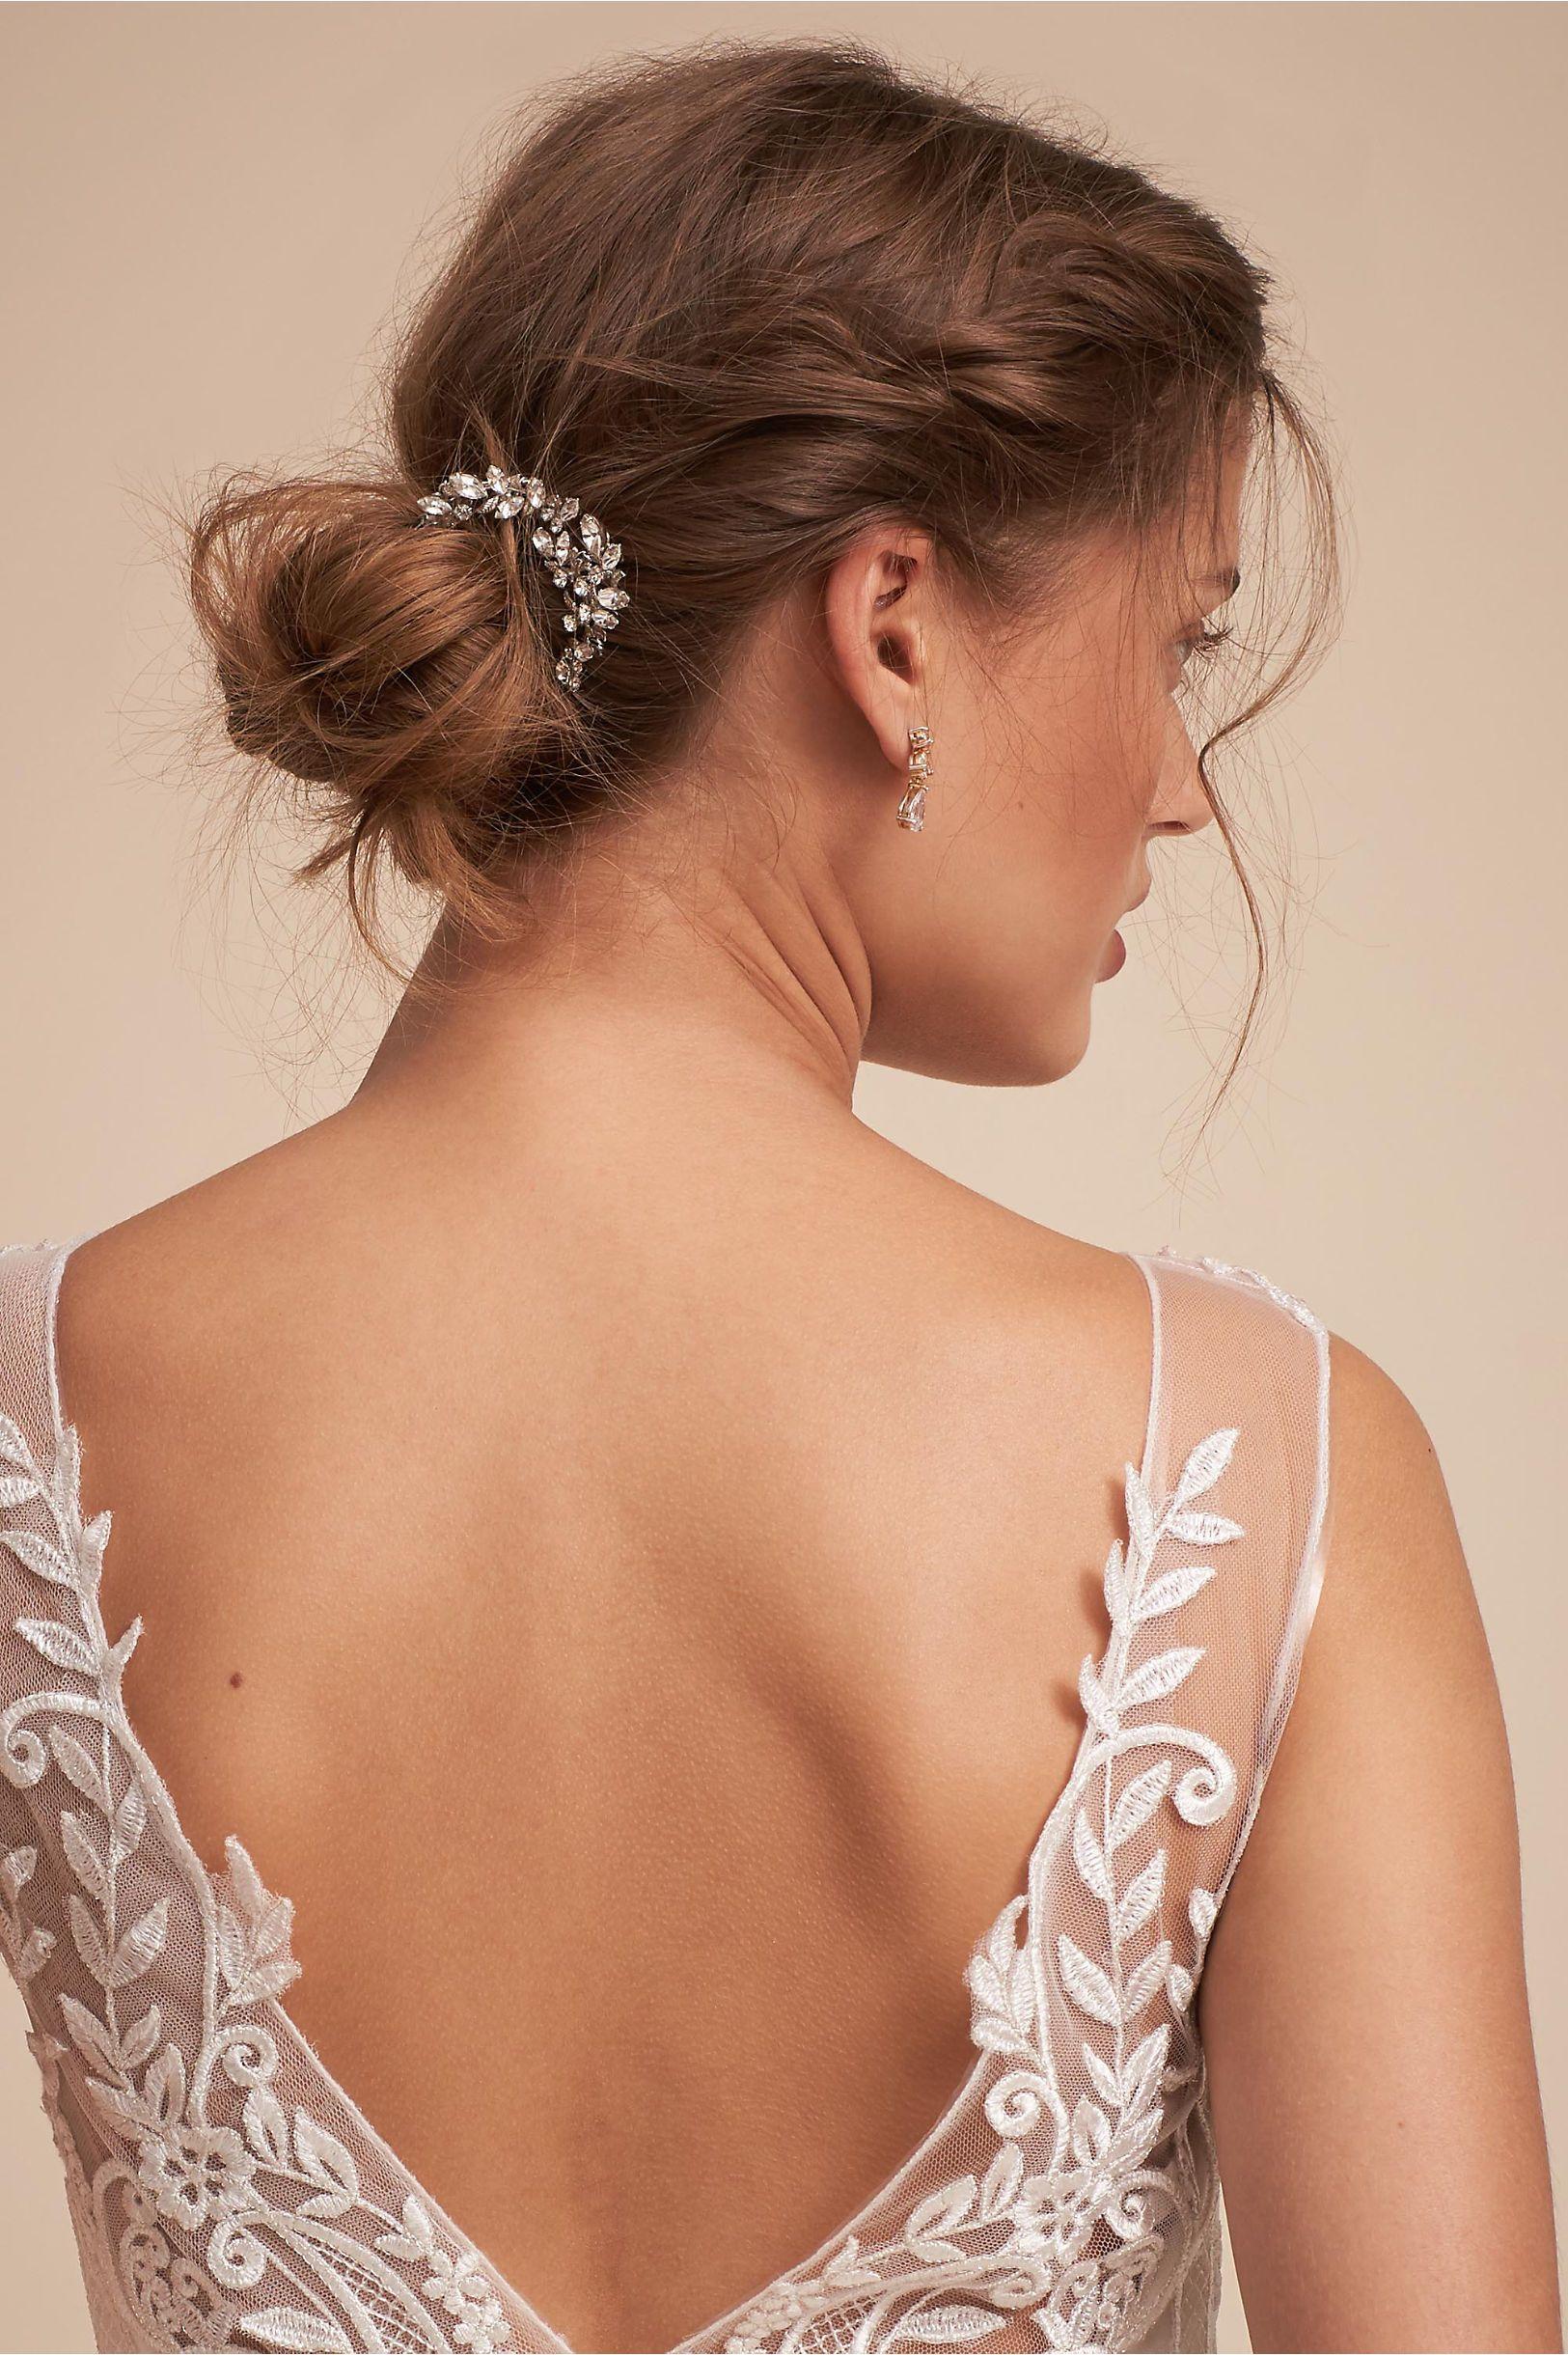 brockton hair combs (2) | products | elegant wedding hair